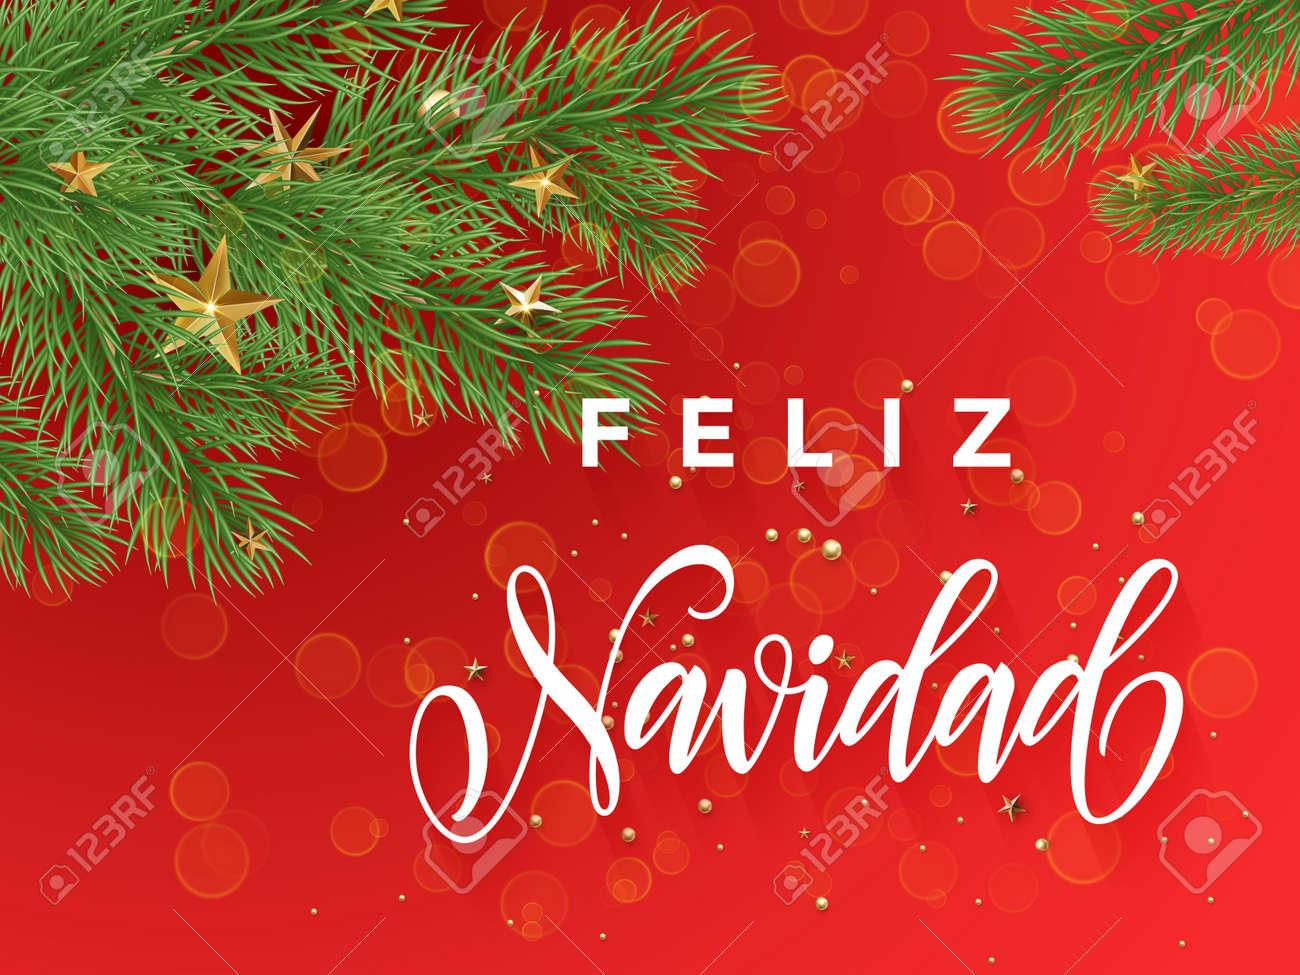 Spanish Merry Christmas Feliz Navidad Text Greeting Calligraphy